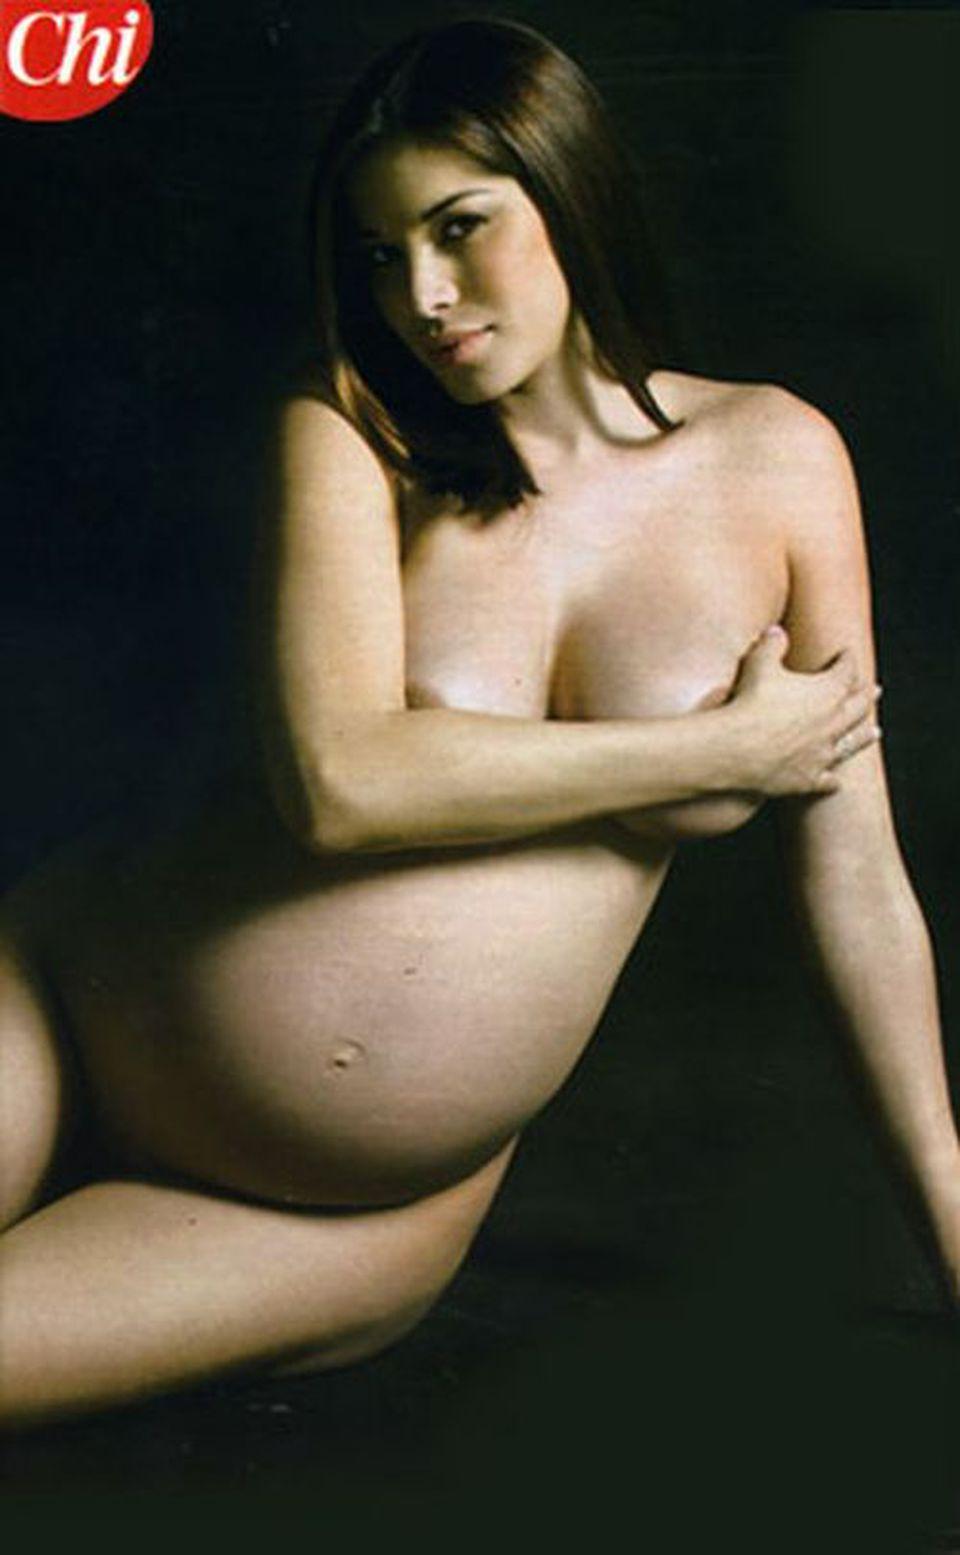 tatt of sexy tinkerbell naked